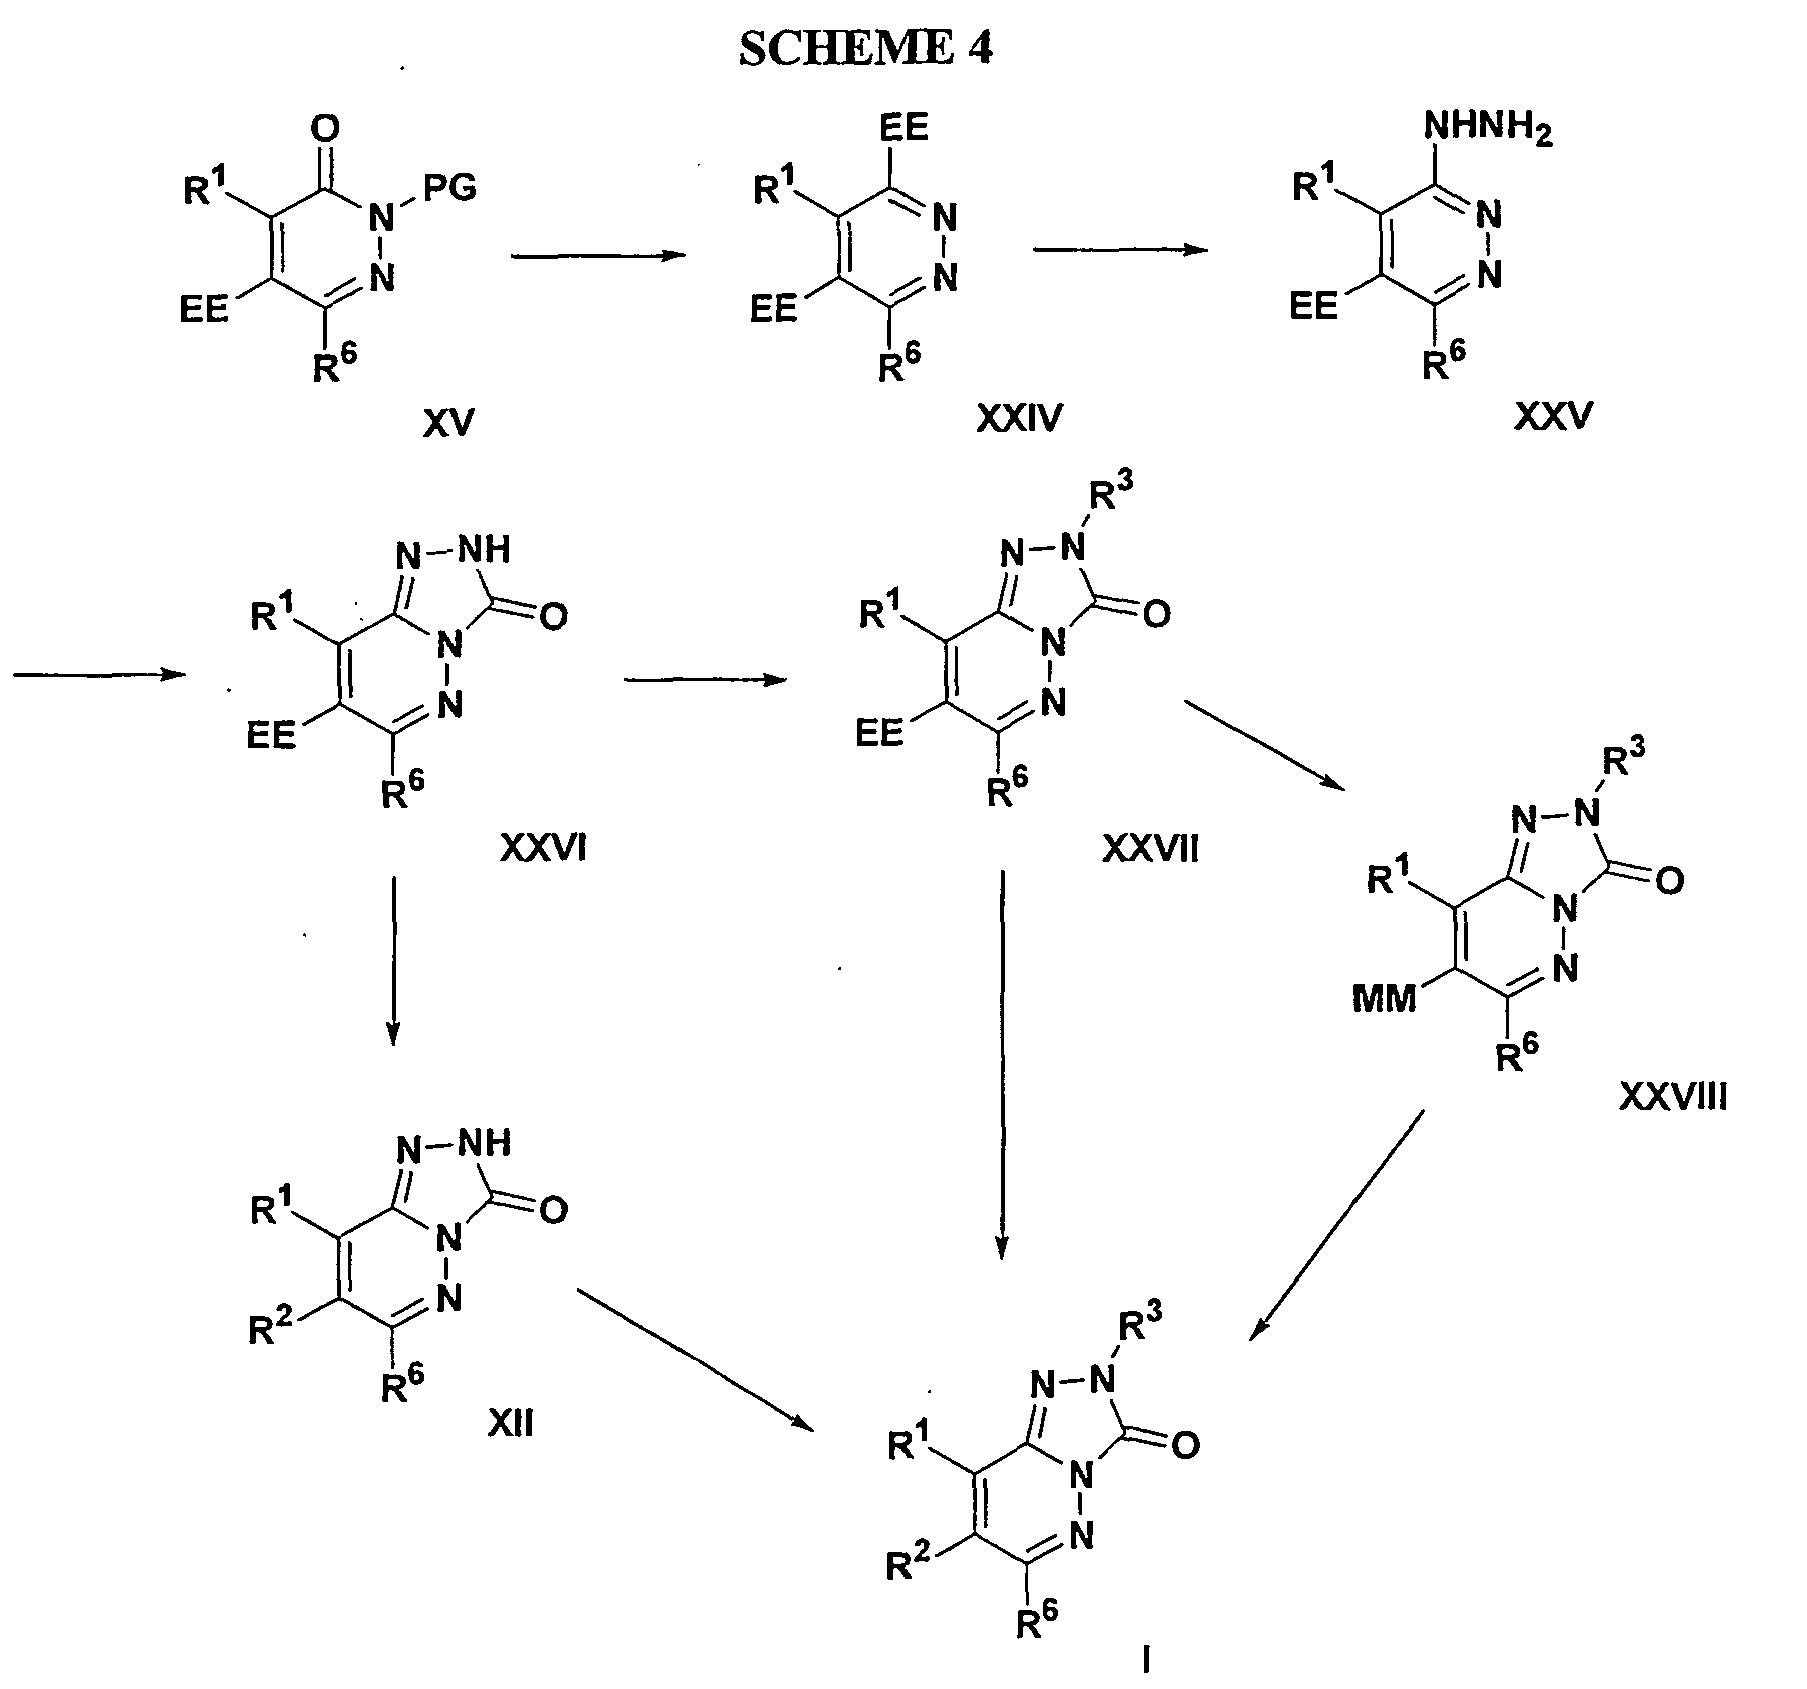 viagra 100mg generic levitra